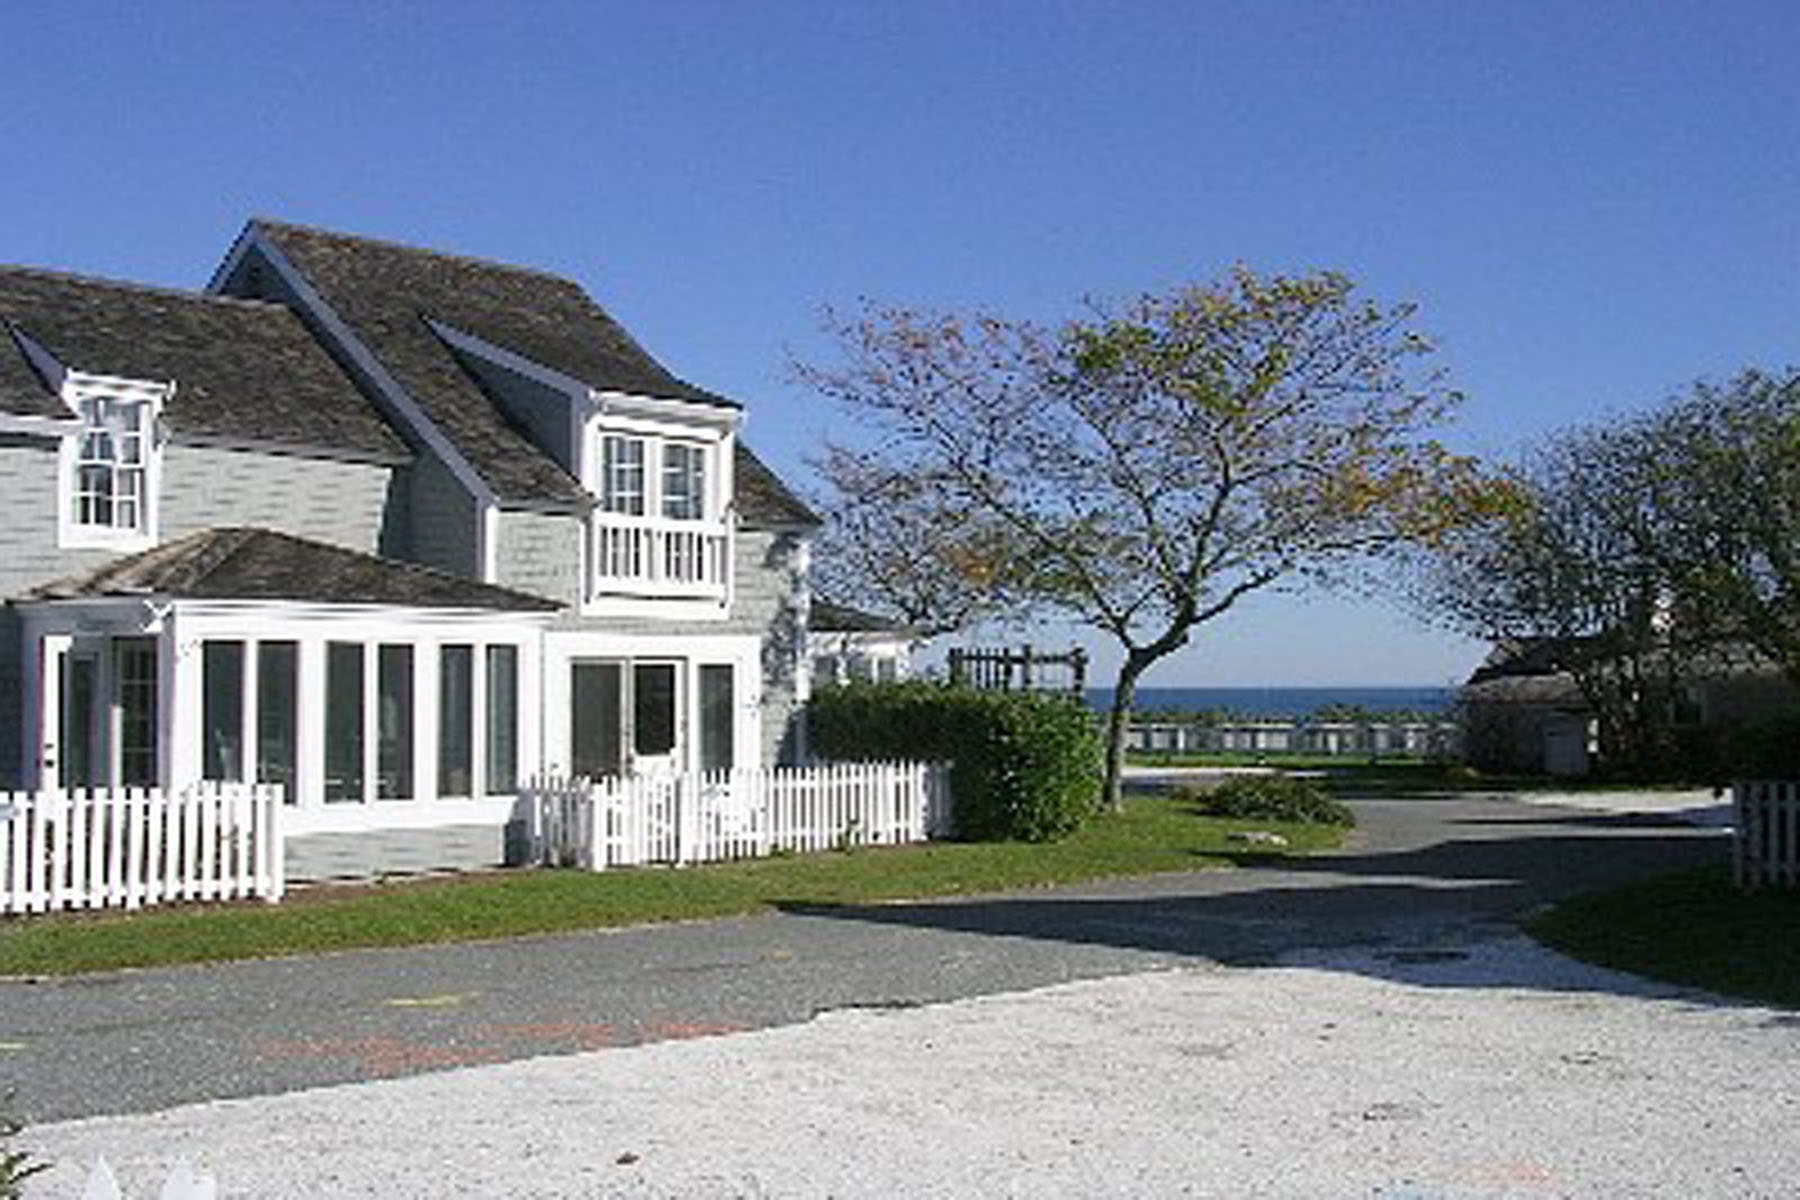 Single Family Homes for Sale at SEASIDE VILLA STEPS FROM SANDY OCEAN BEACH 25 Milestone Way New Seabury, Massachusetts 02649 United States